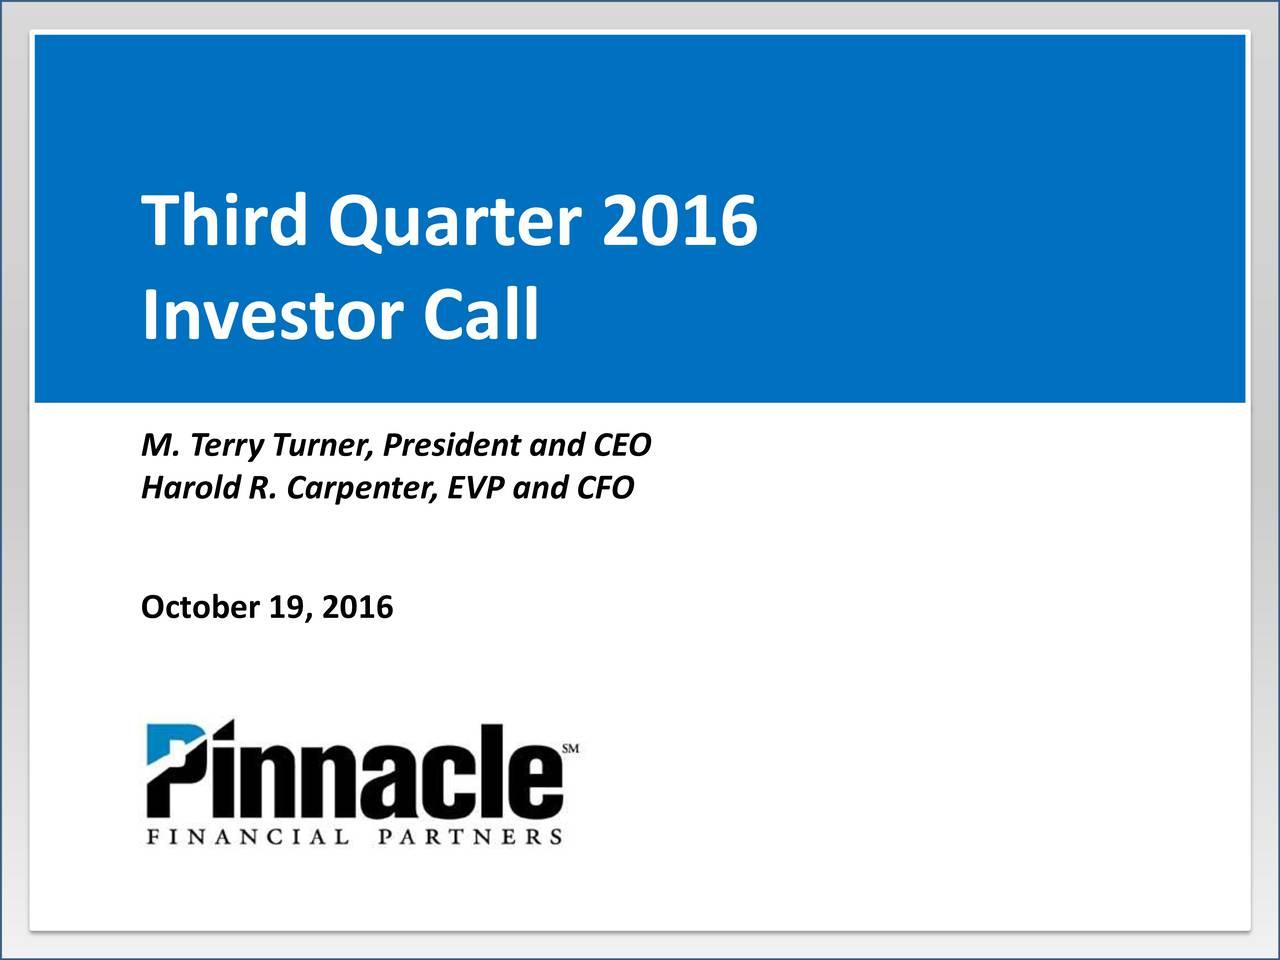 Investor Call Harold R. Carpenter, EVP and CFOEO October 19, 2016